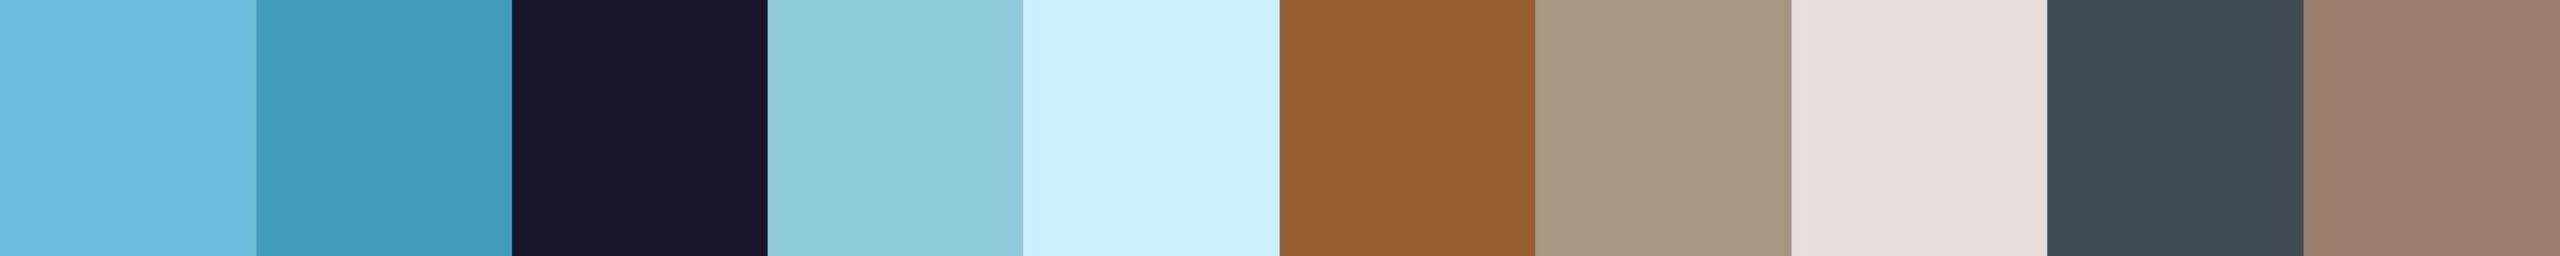 406 Lestavia Color Palette